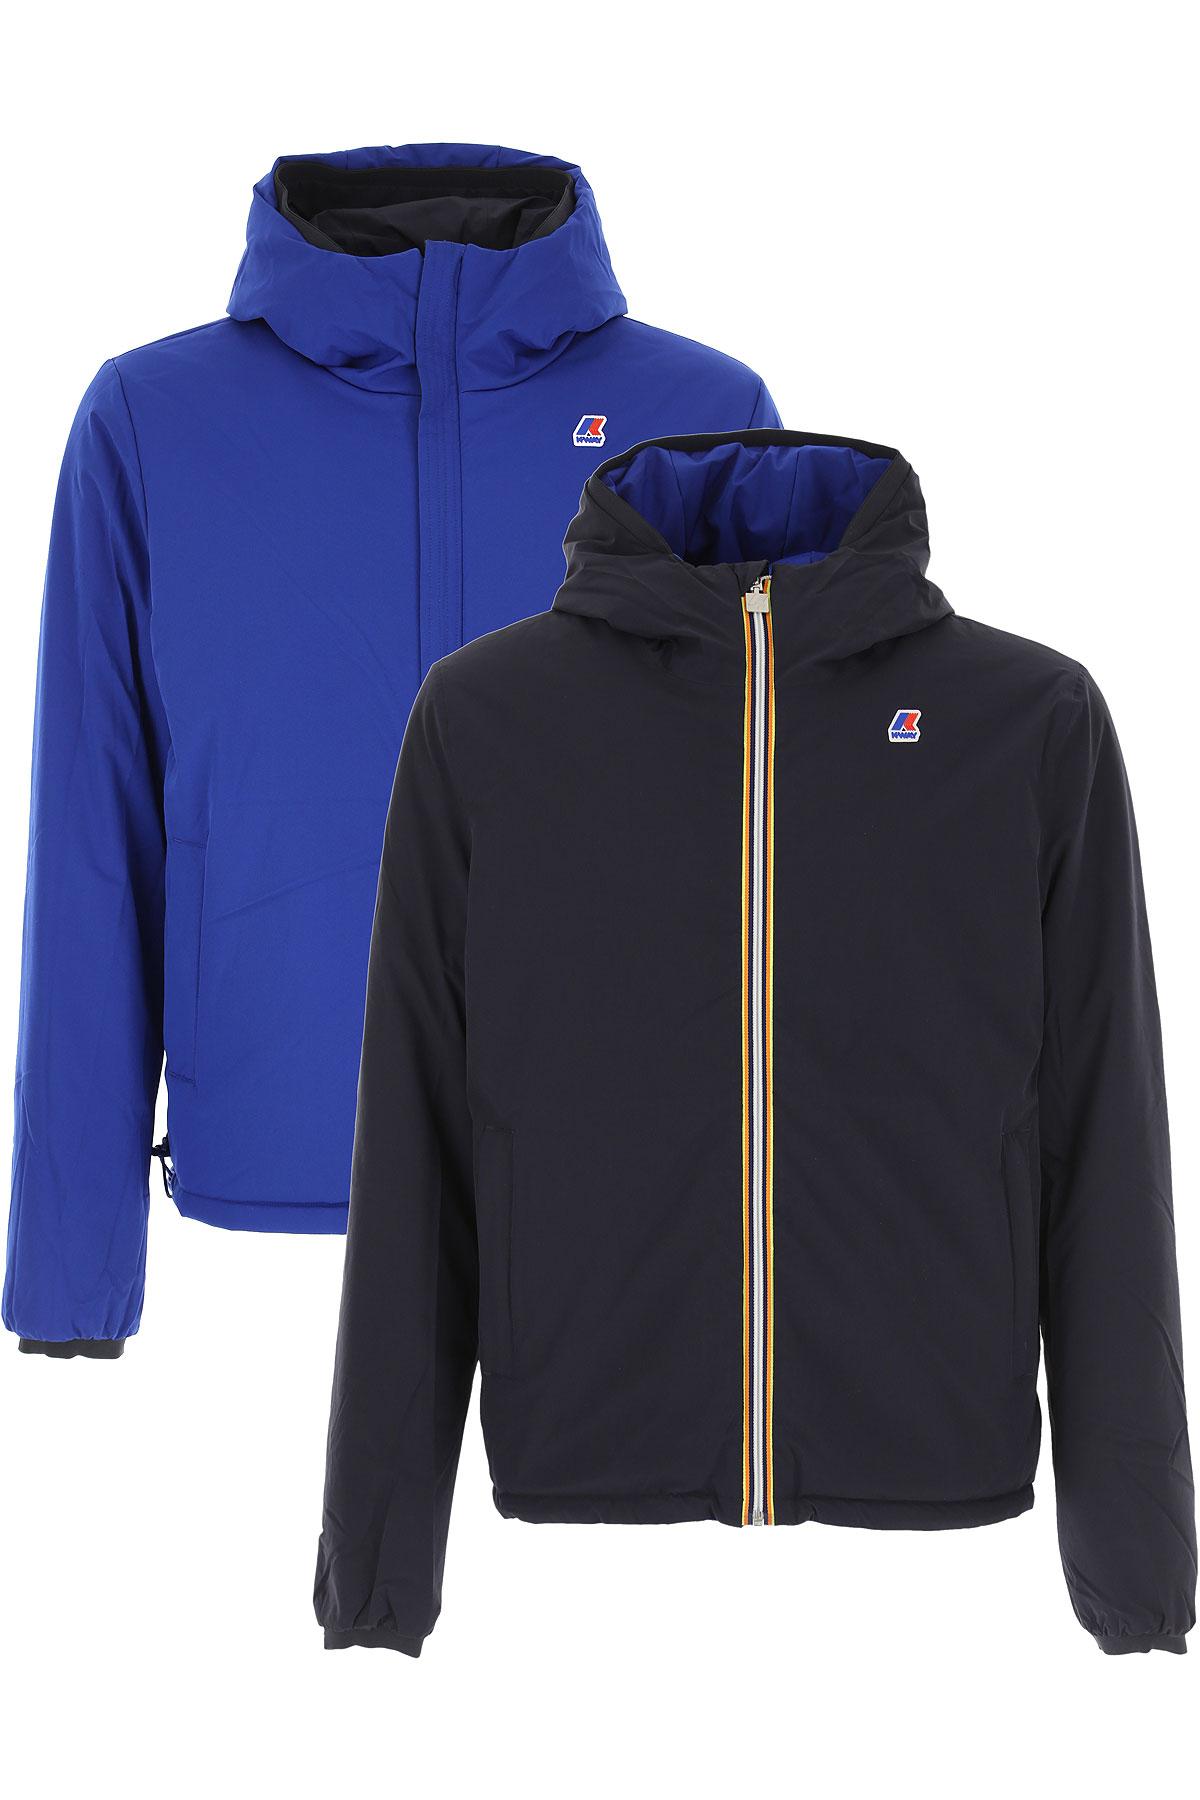 K-Way Down Jacket for Men, Puffer Ski Jacket On Sale, navy, polyamide, 2019, L M S XL XXL